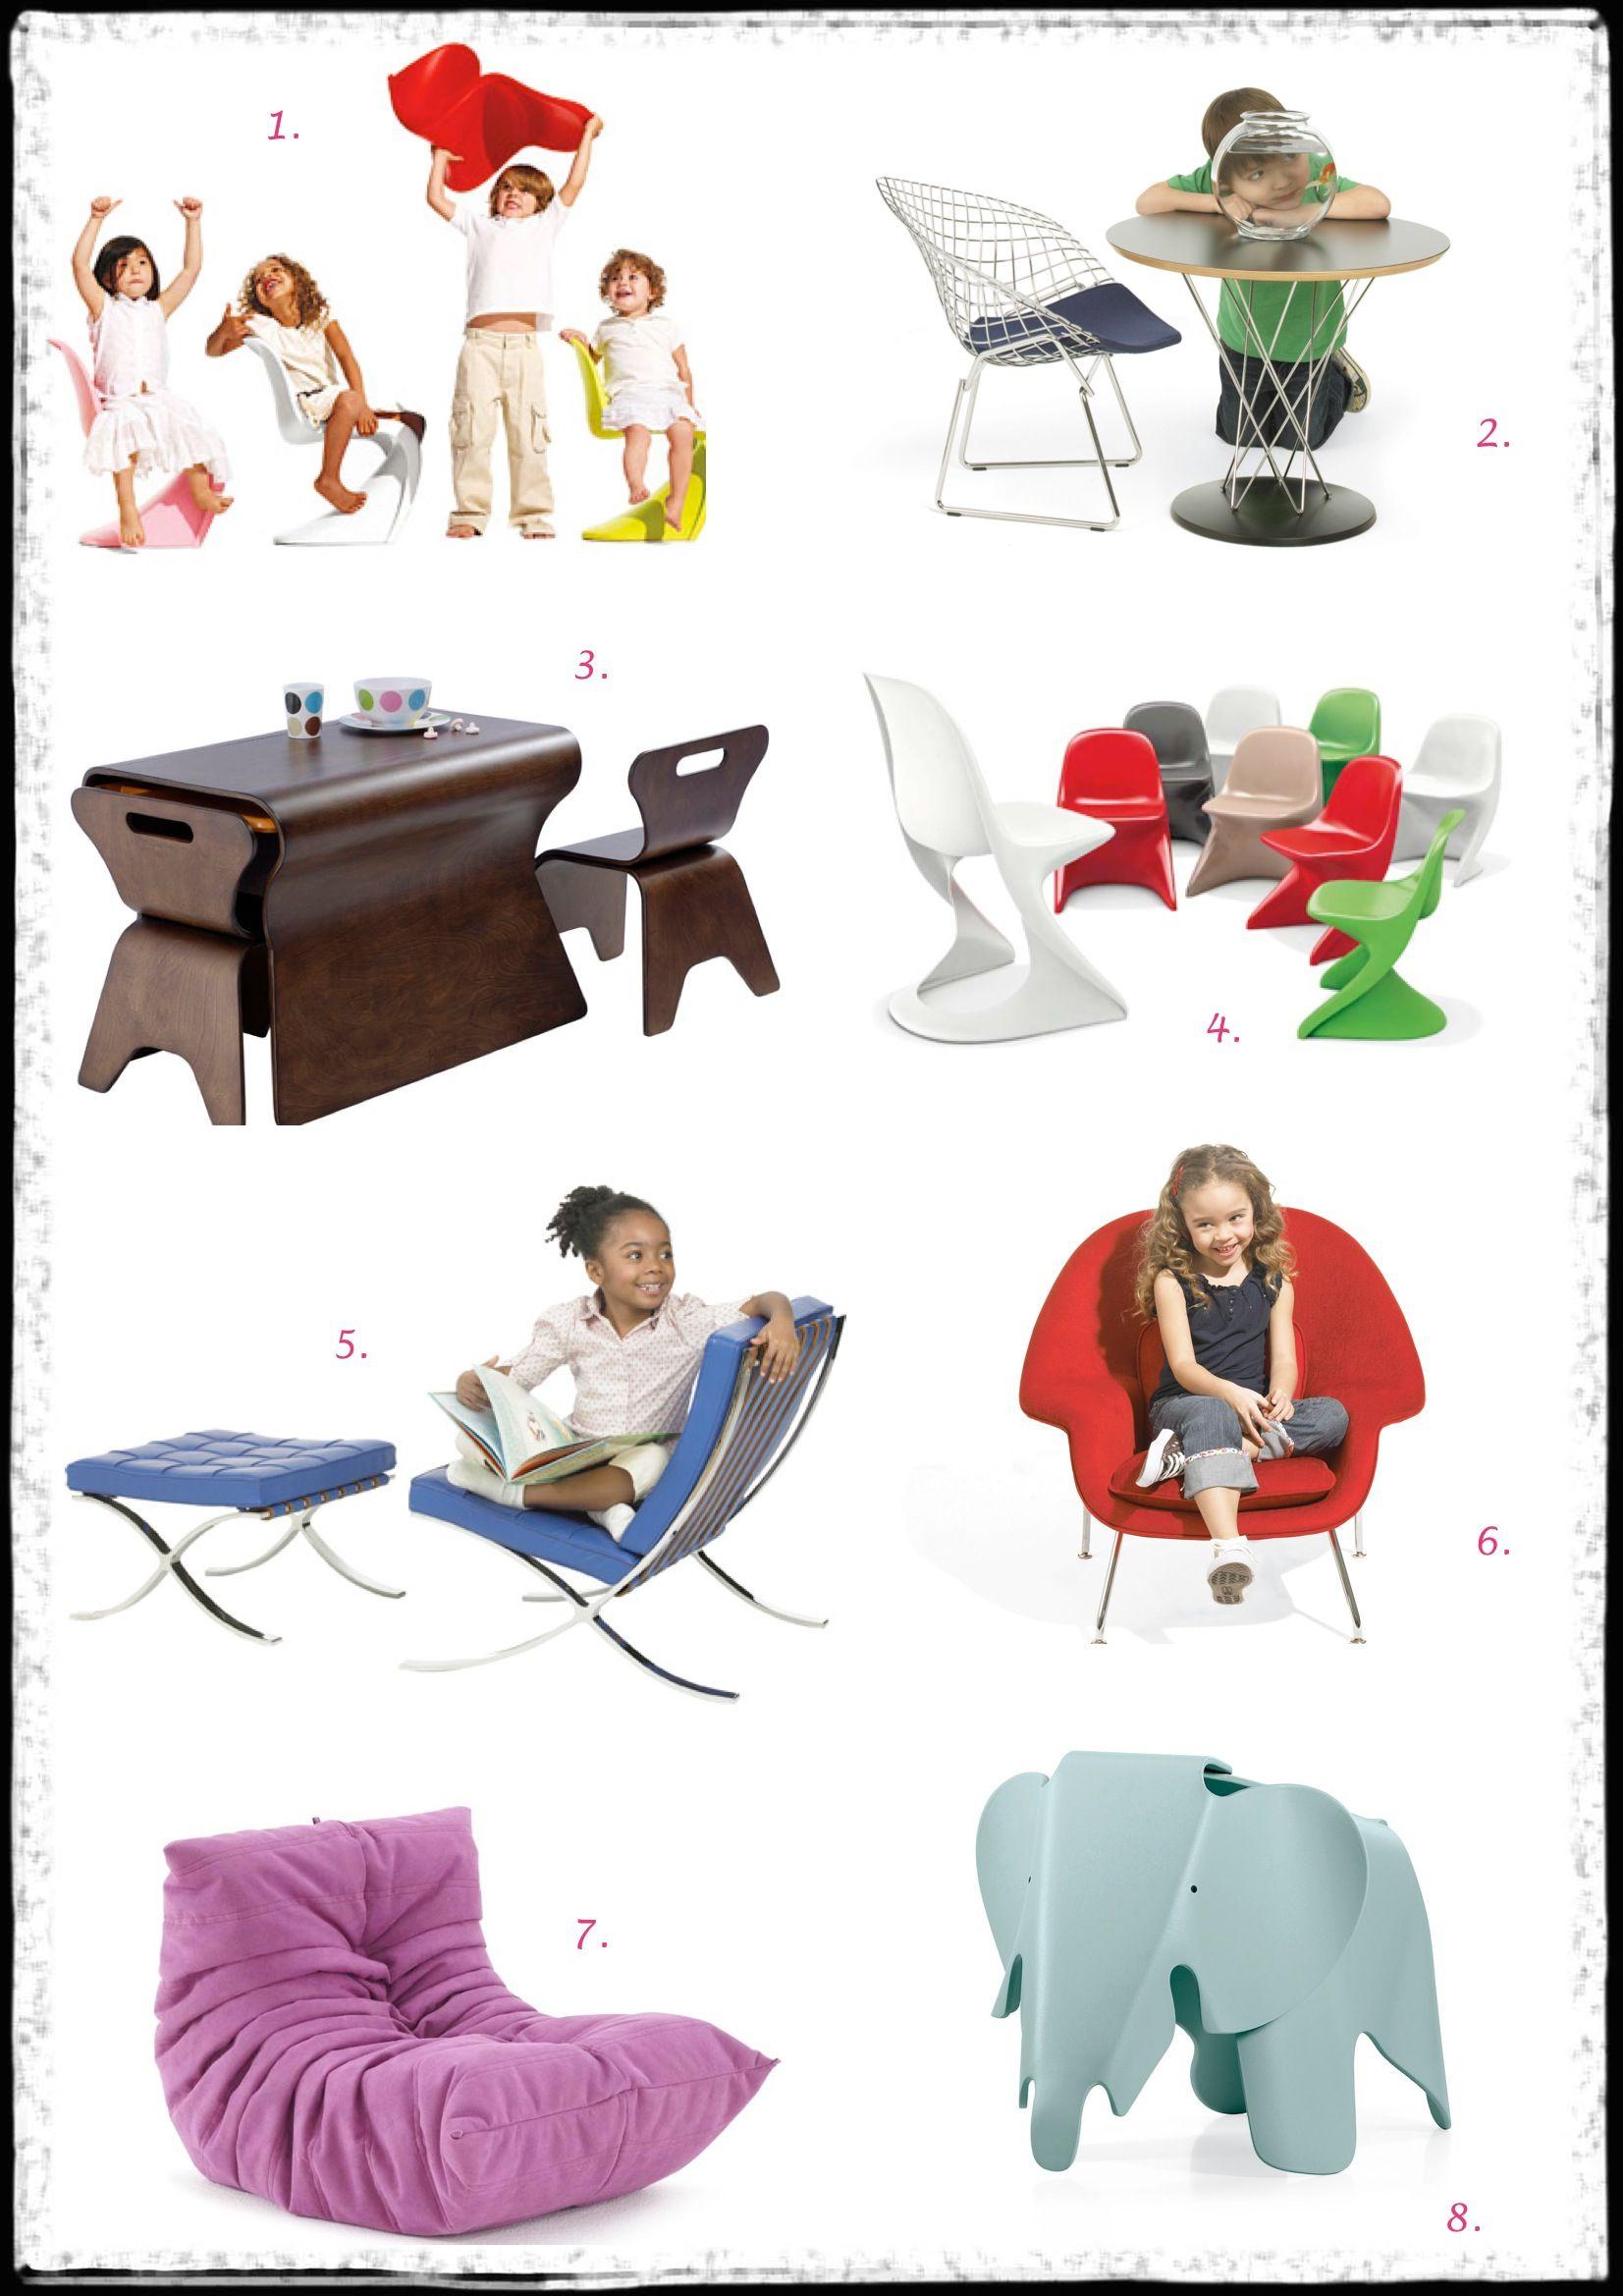 childrens panton chair osaka massage 1 vitra  jr 2 knoll kids childs